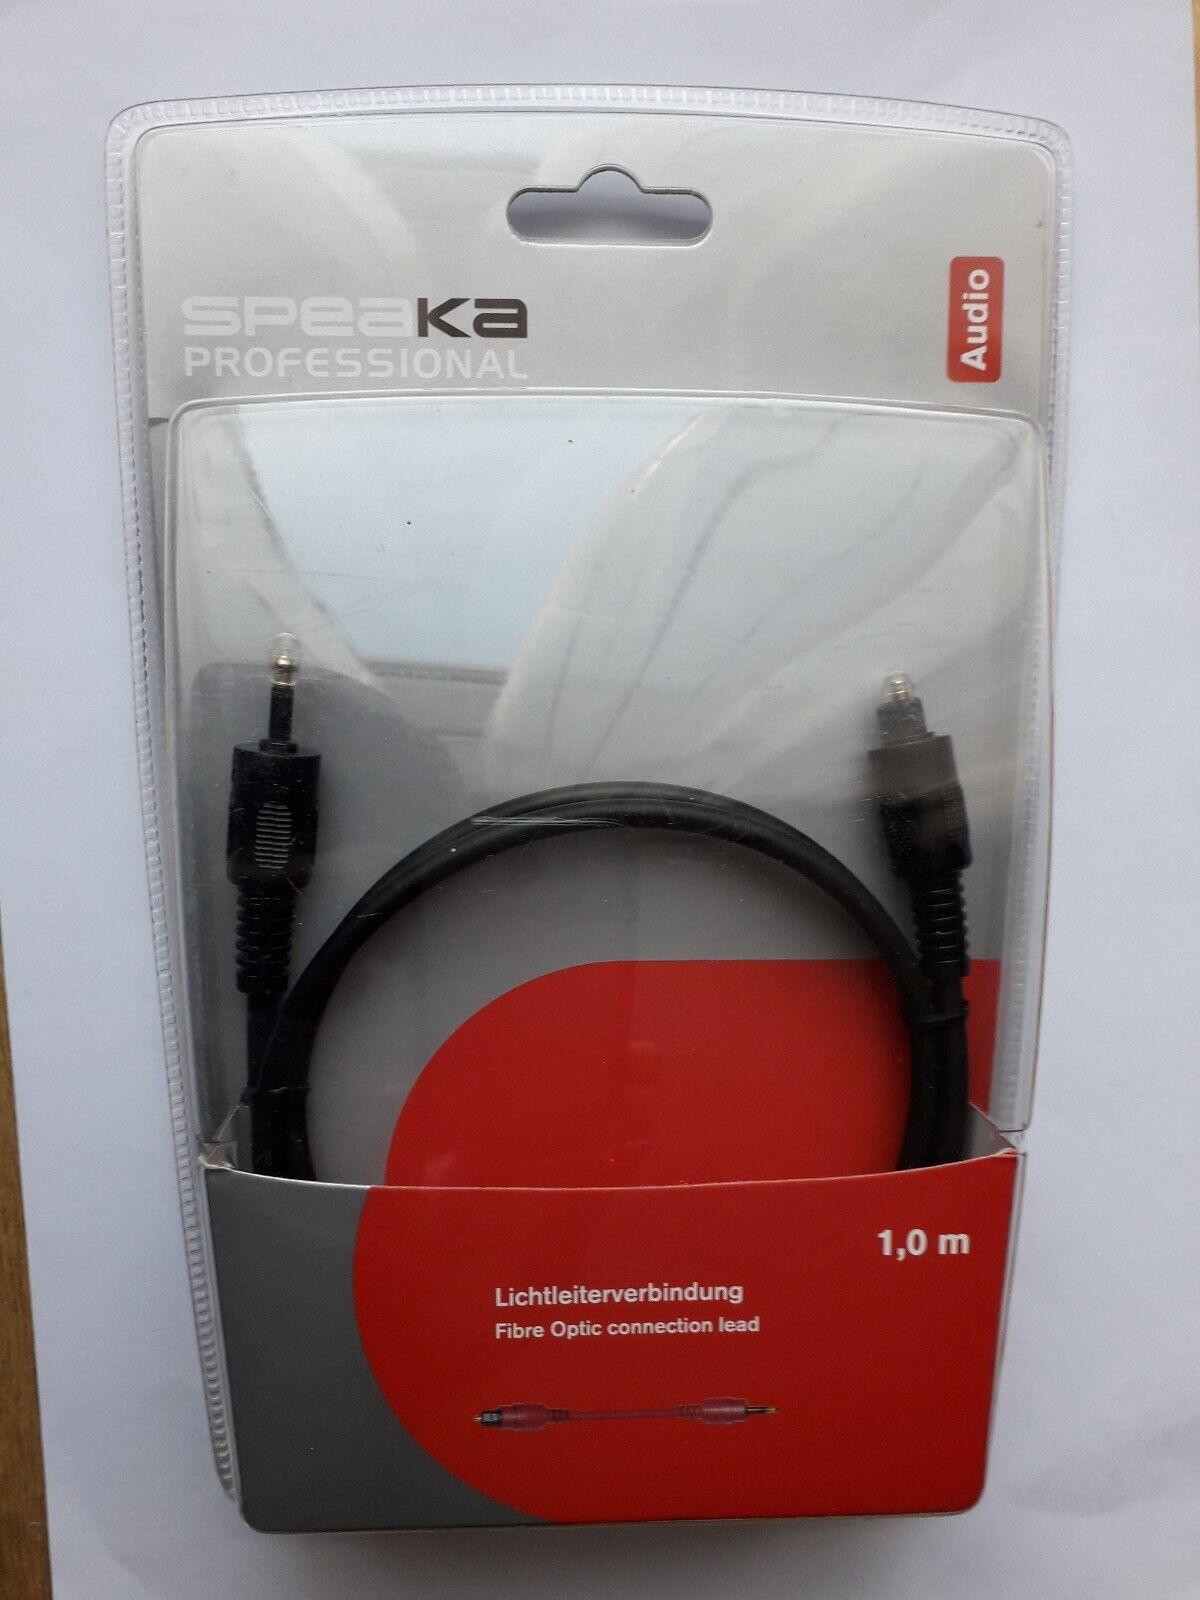 AUDIO FIBRE Optic connector Leads (1Metre) CD/DAT/DVD to CD/DAT/DVD-Black.Speaka